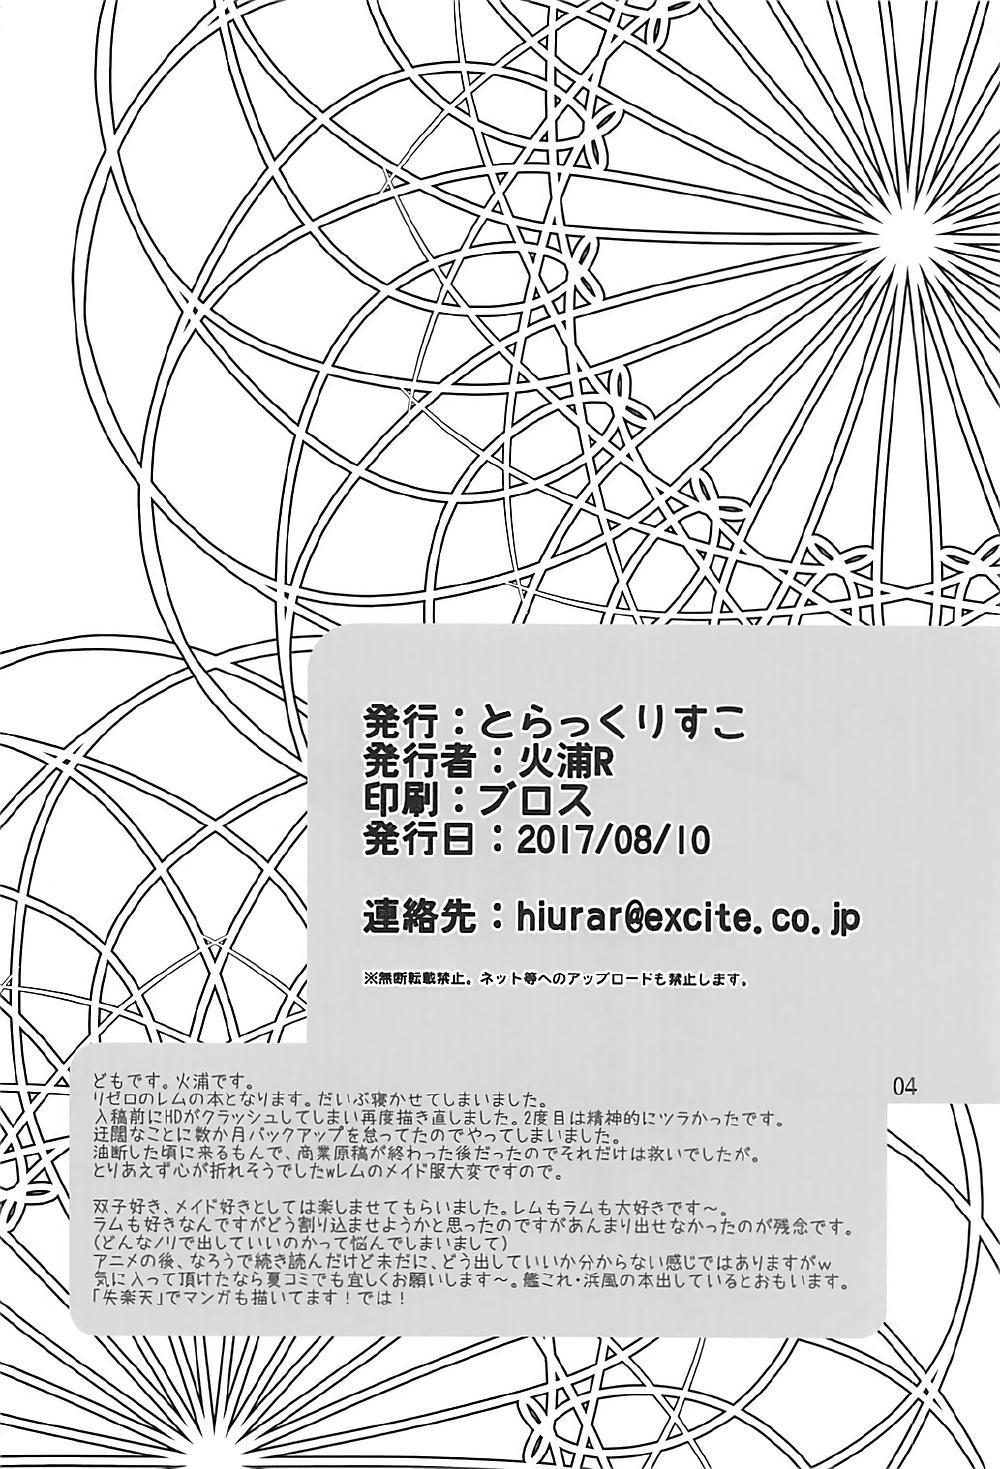 Nandome no Hajimete. 2